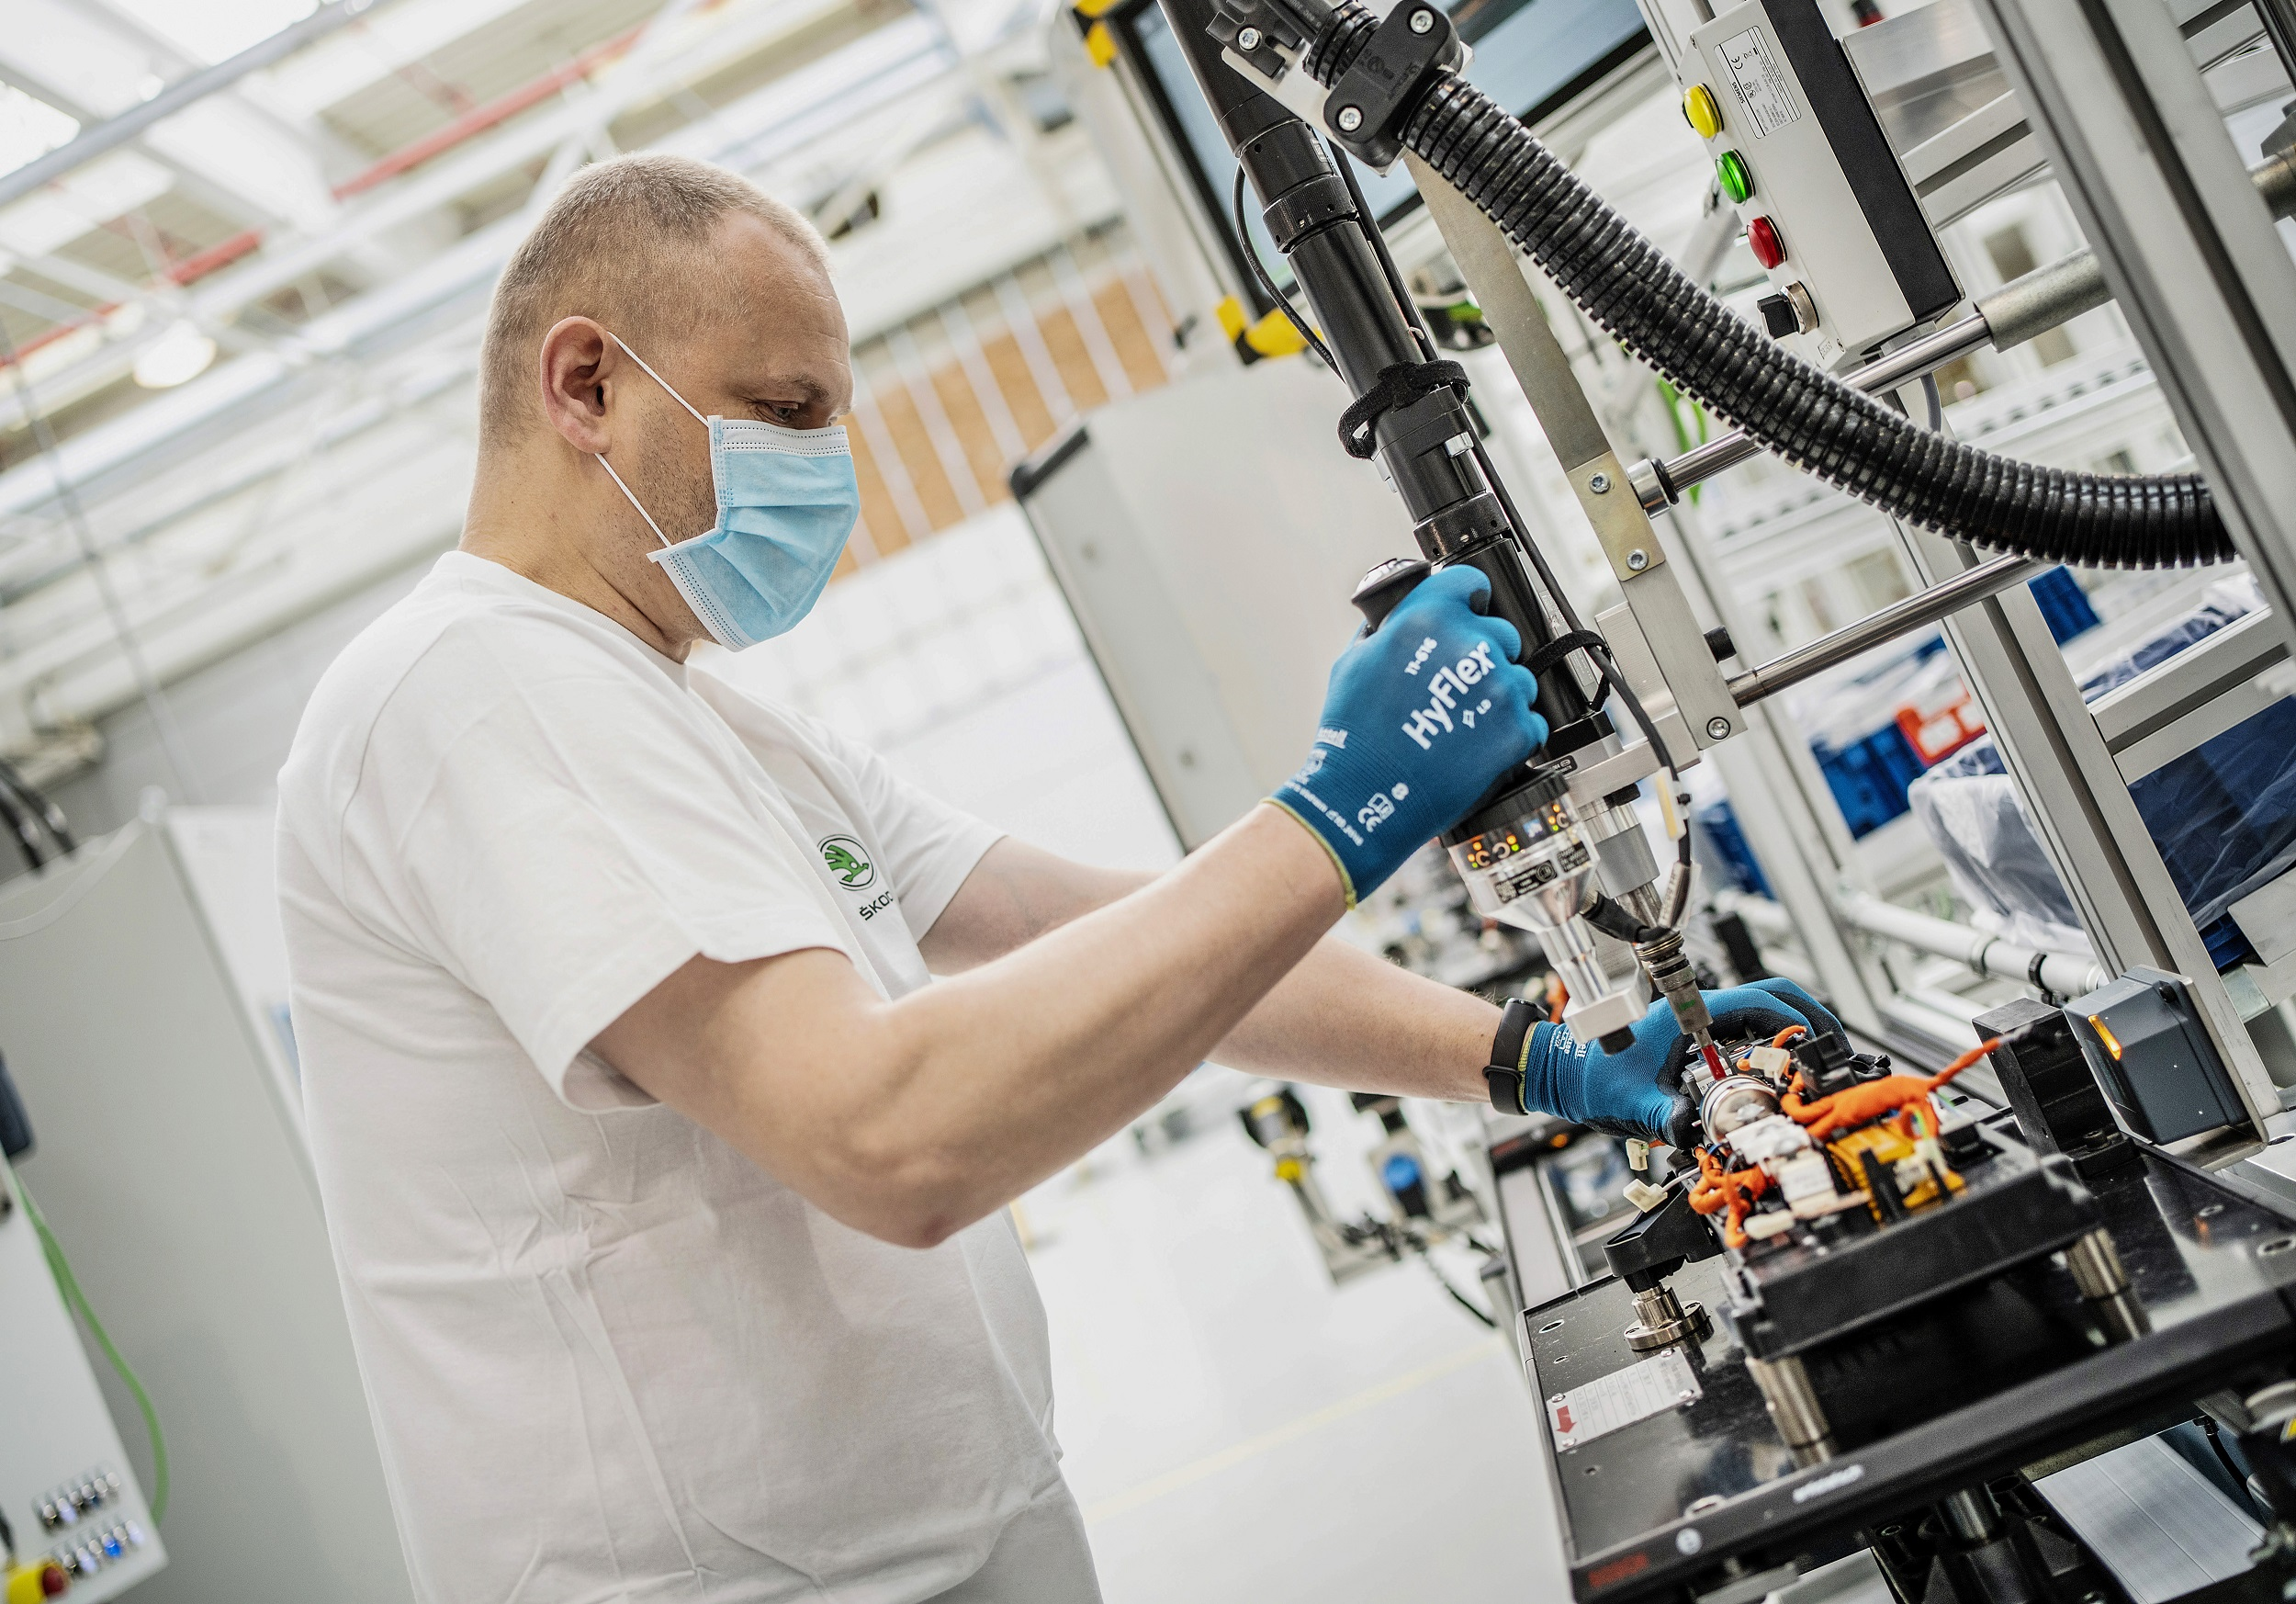 Skoda: Επανέναρξη παραγωγής μπαταριών υψηλής τάσης